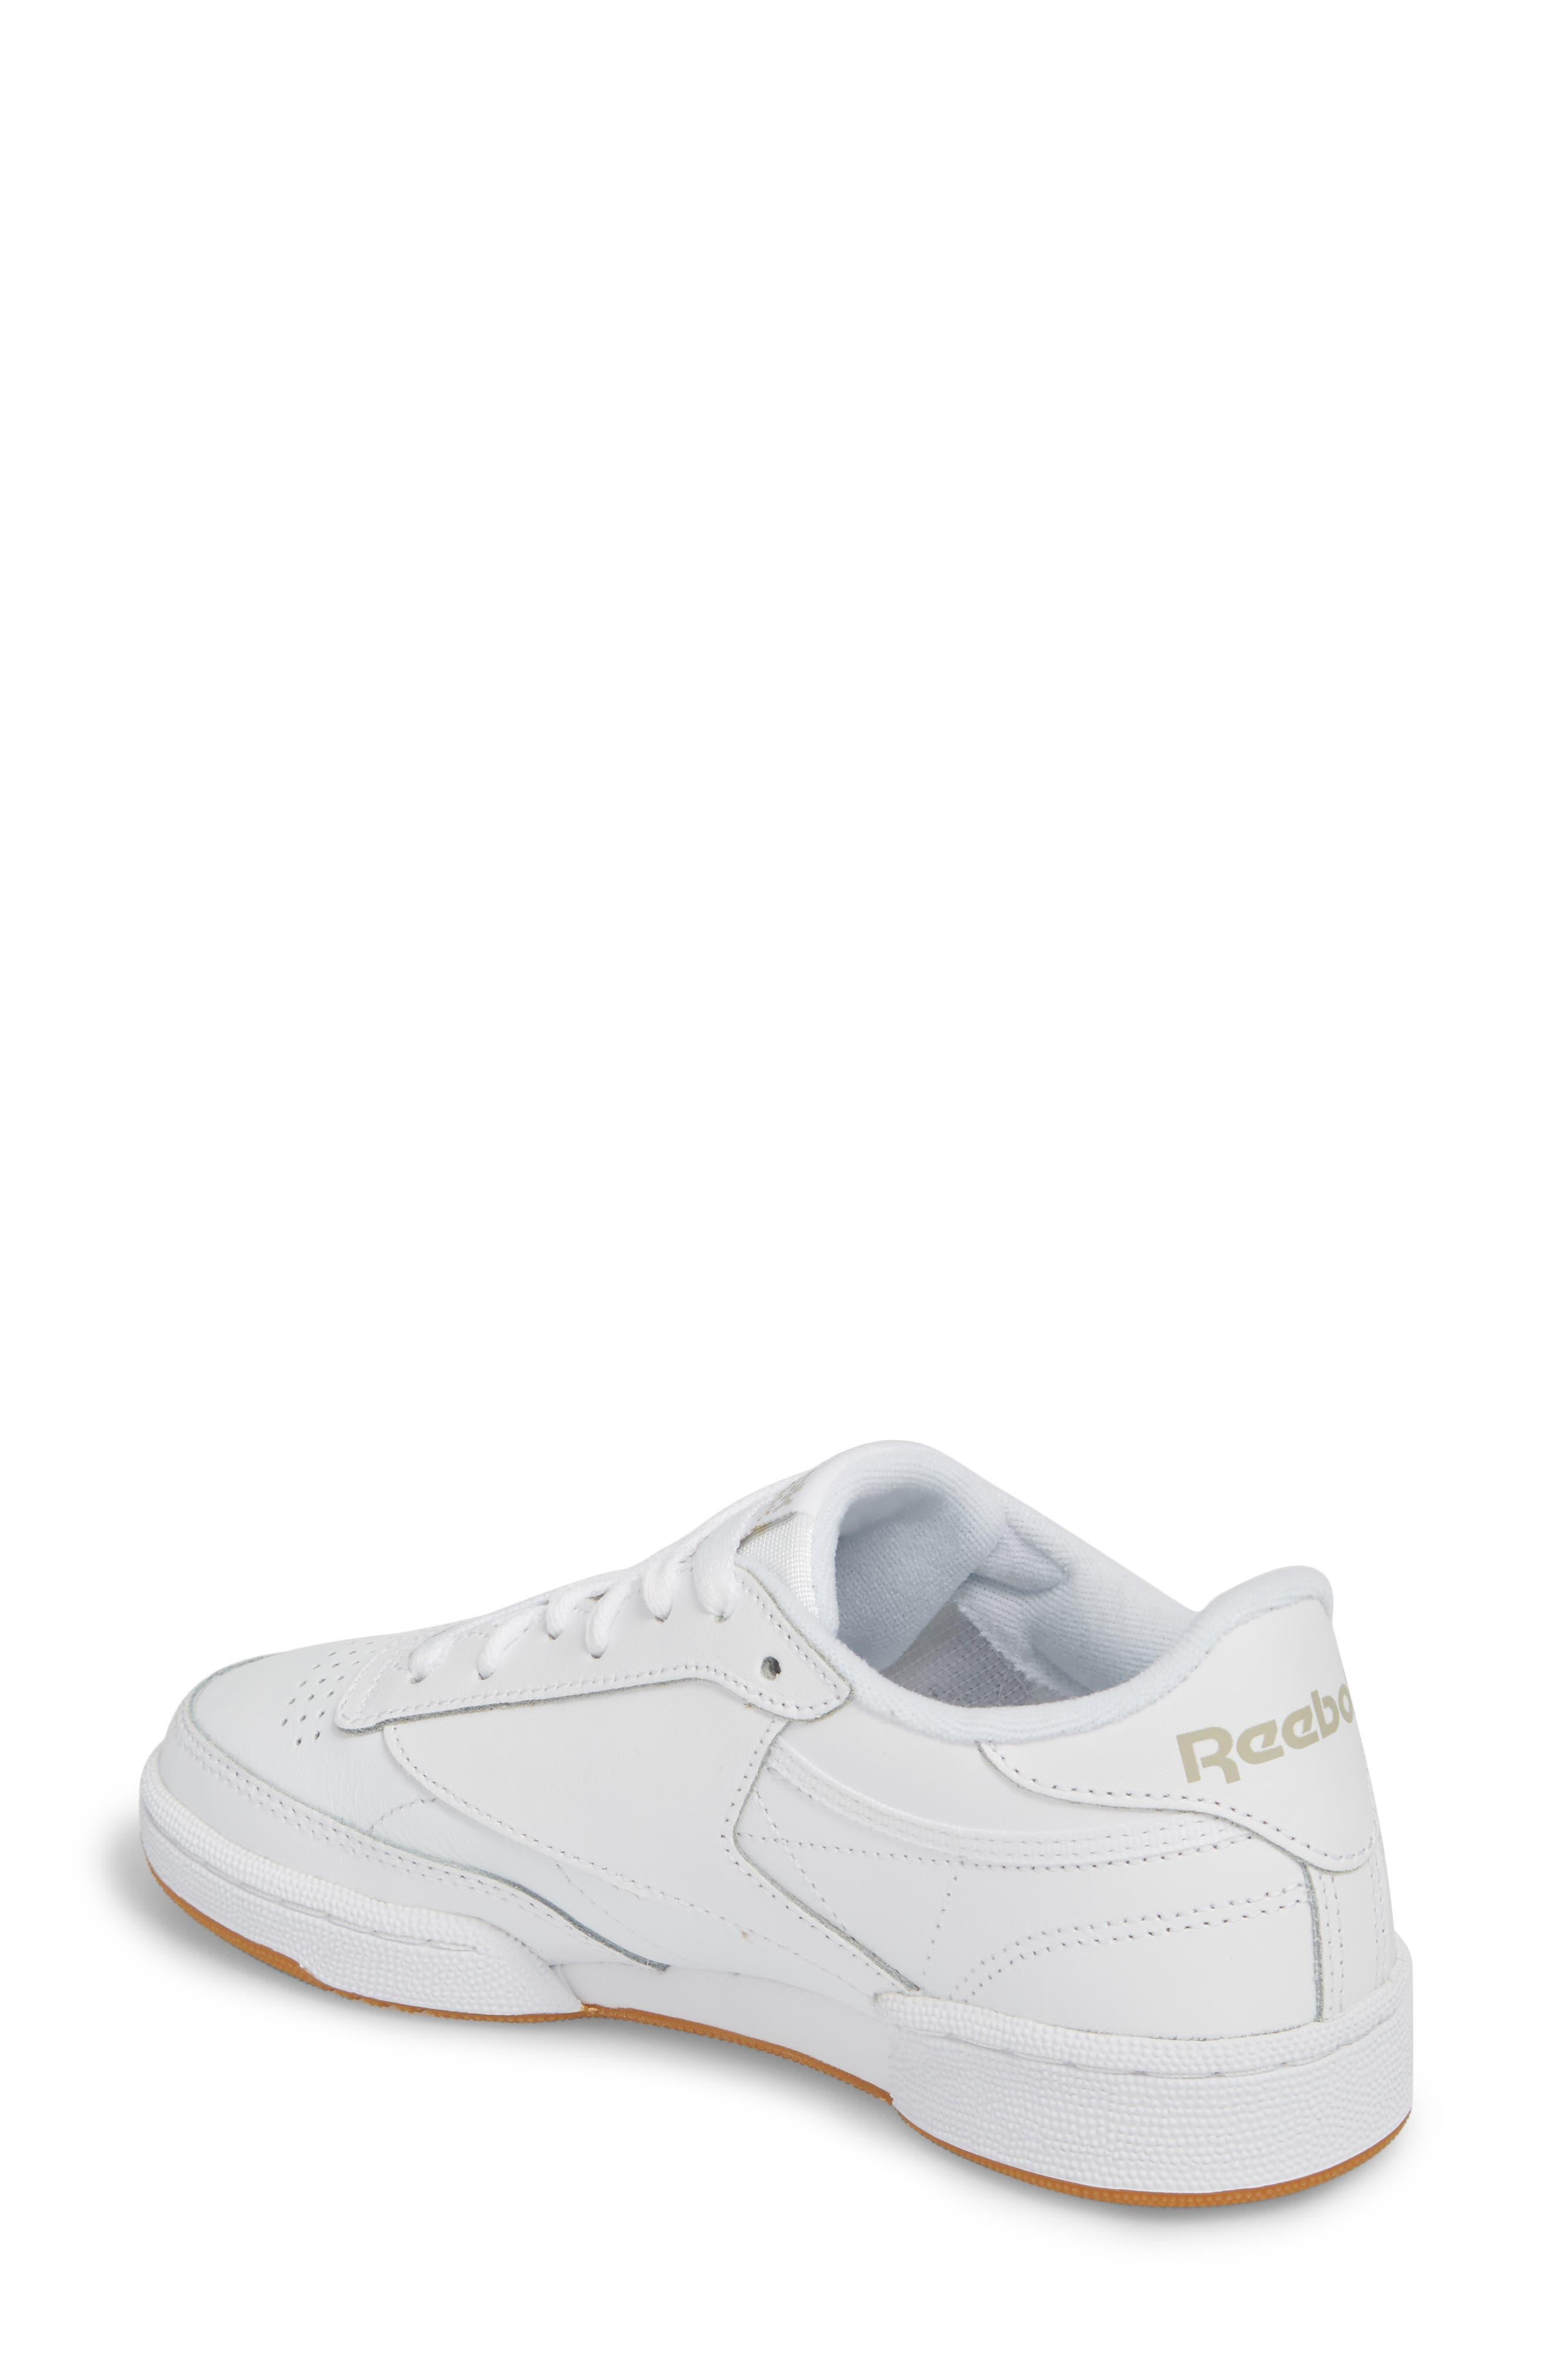 REEBOK, Club C 85 Sneaker, Alternate thumbnail 2, color, WHITE/ LIGHT GREY/ GUM